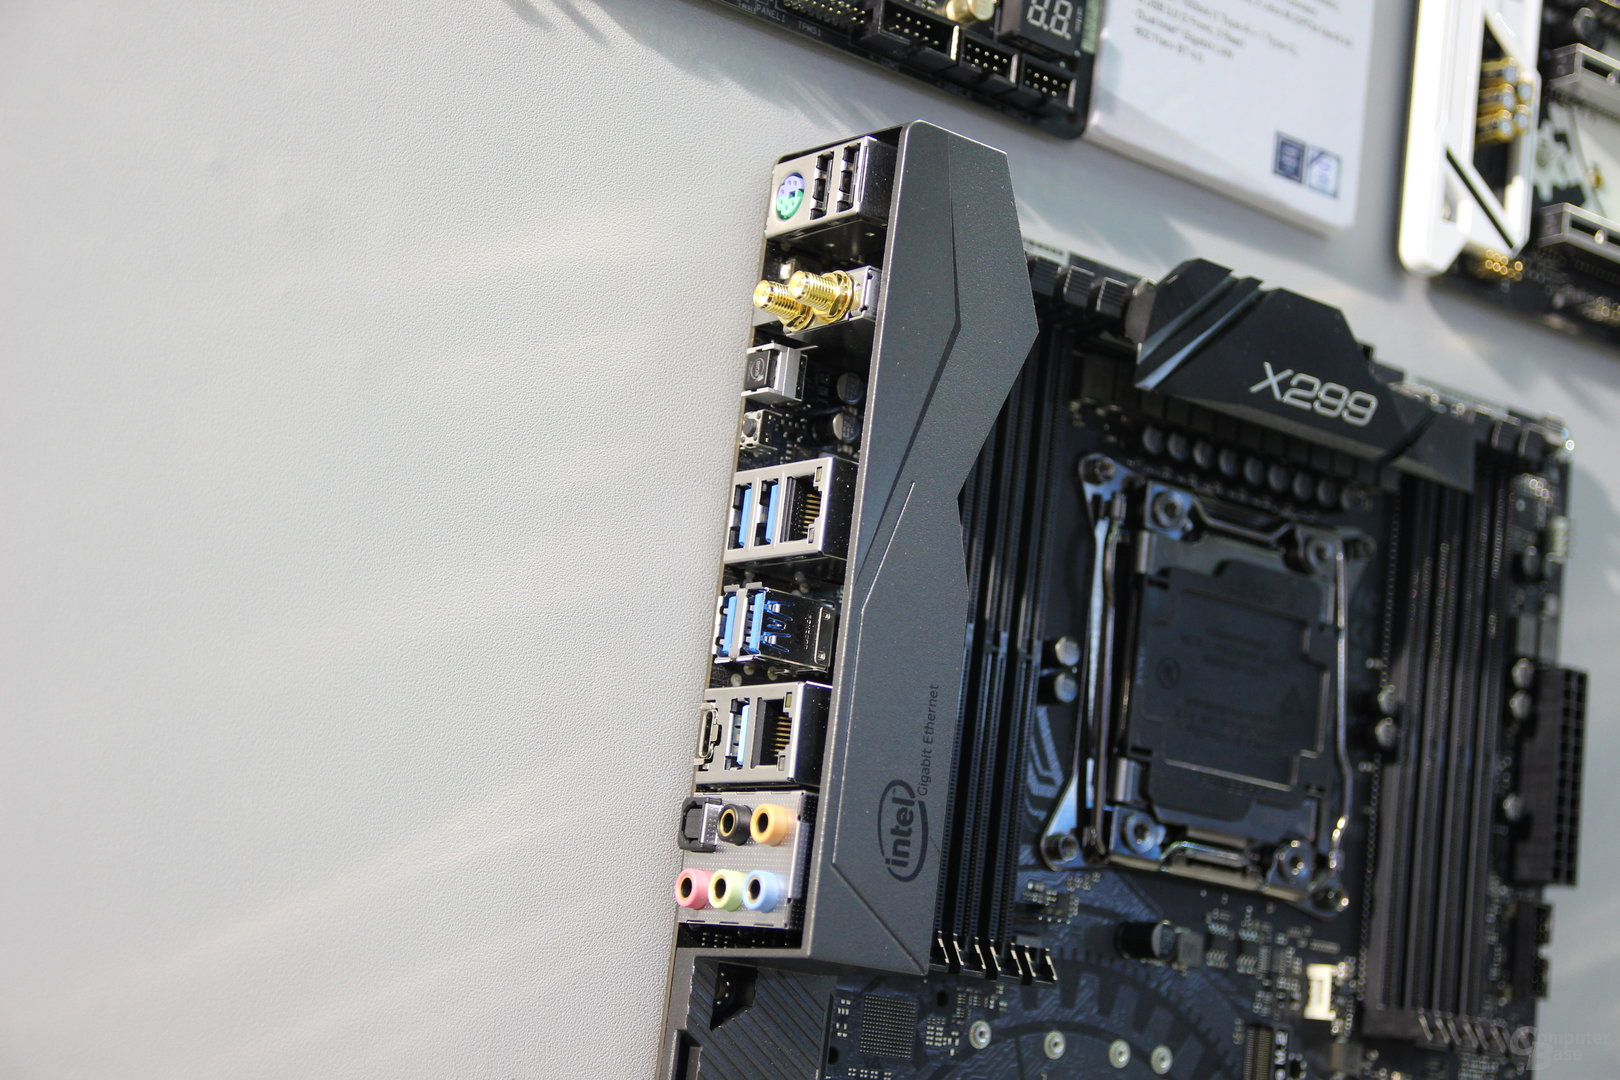 ASRock X299 Taichi